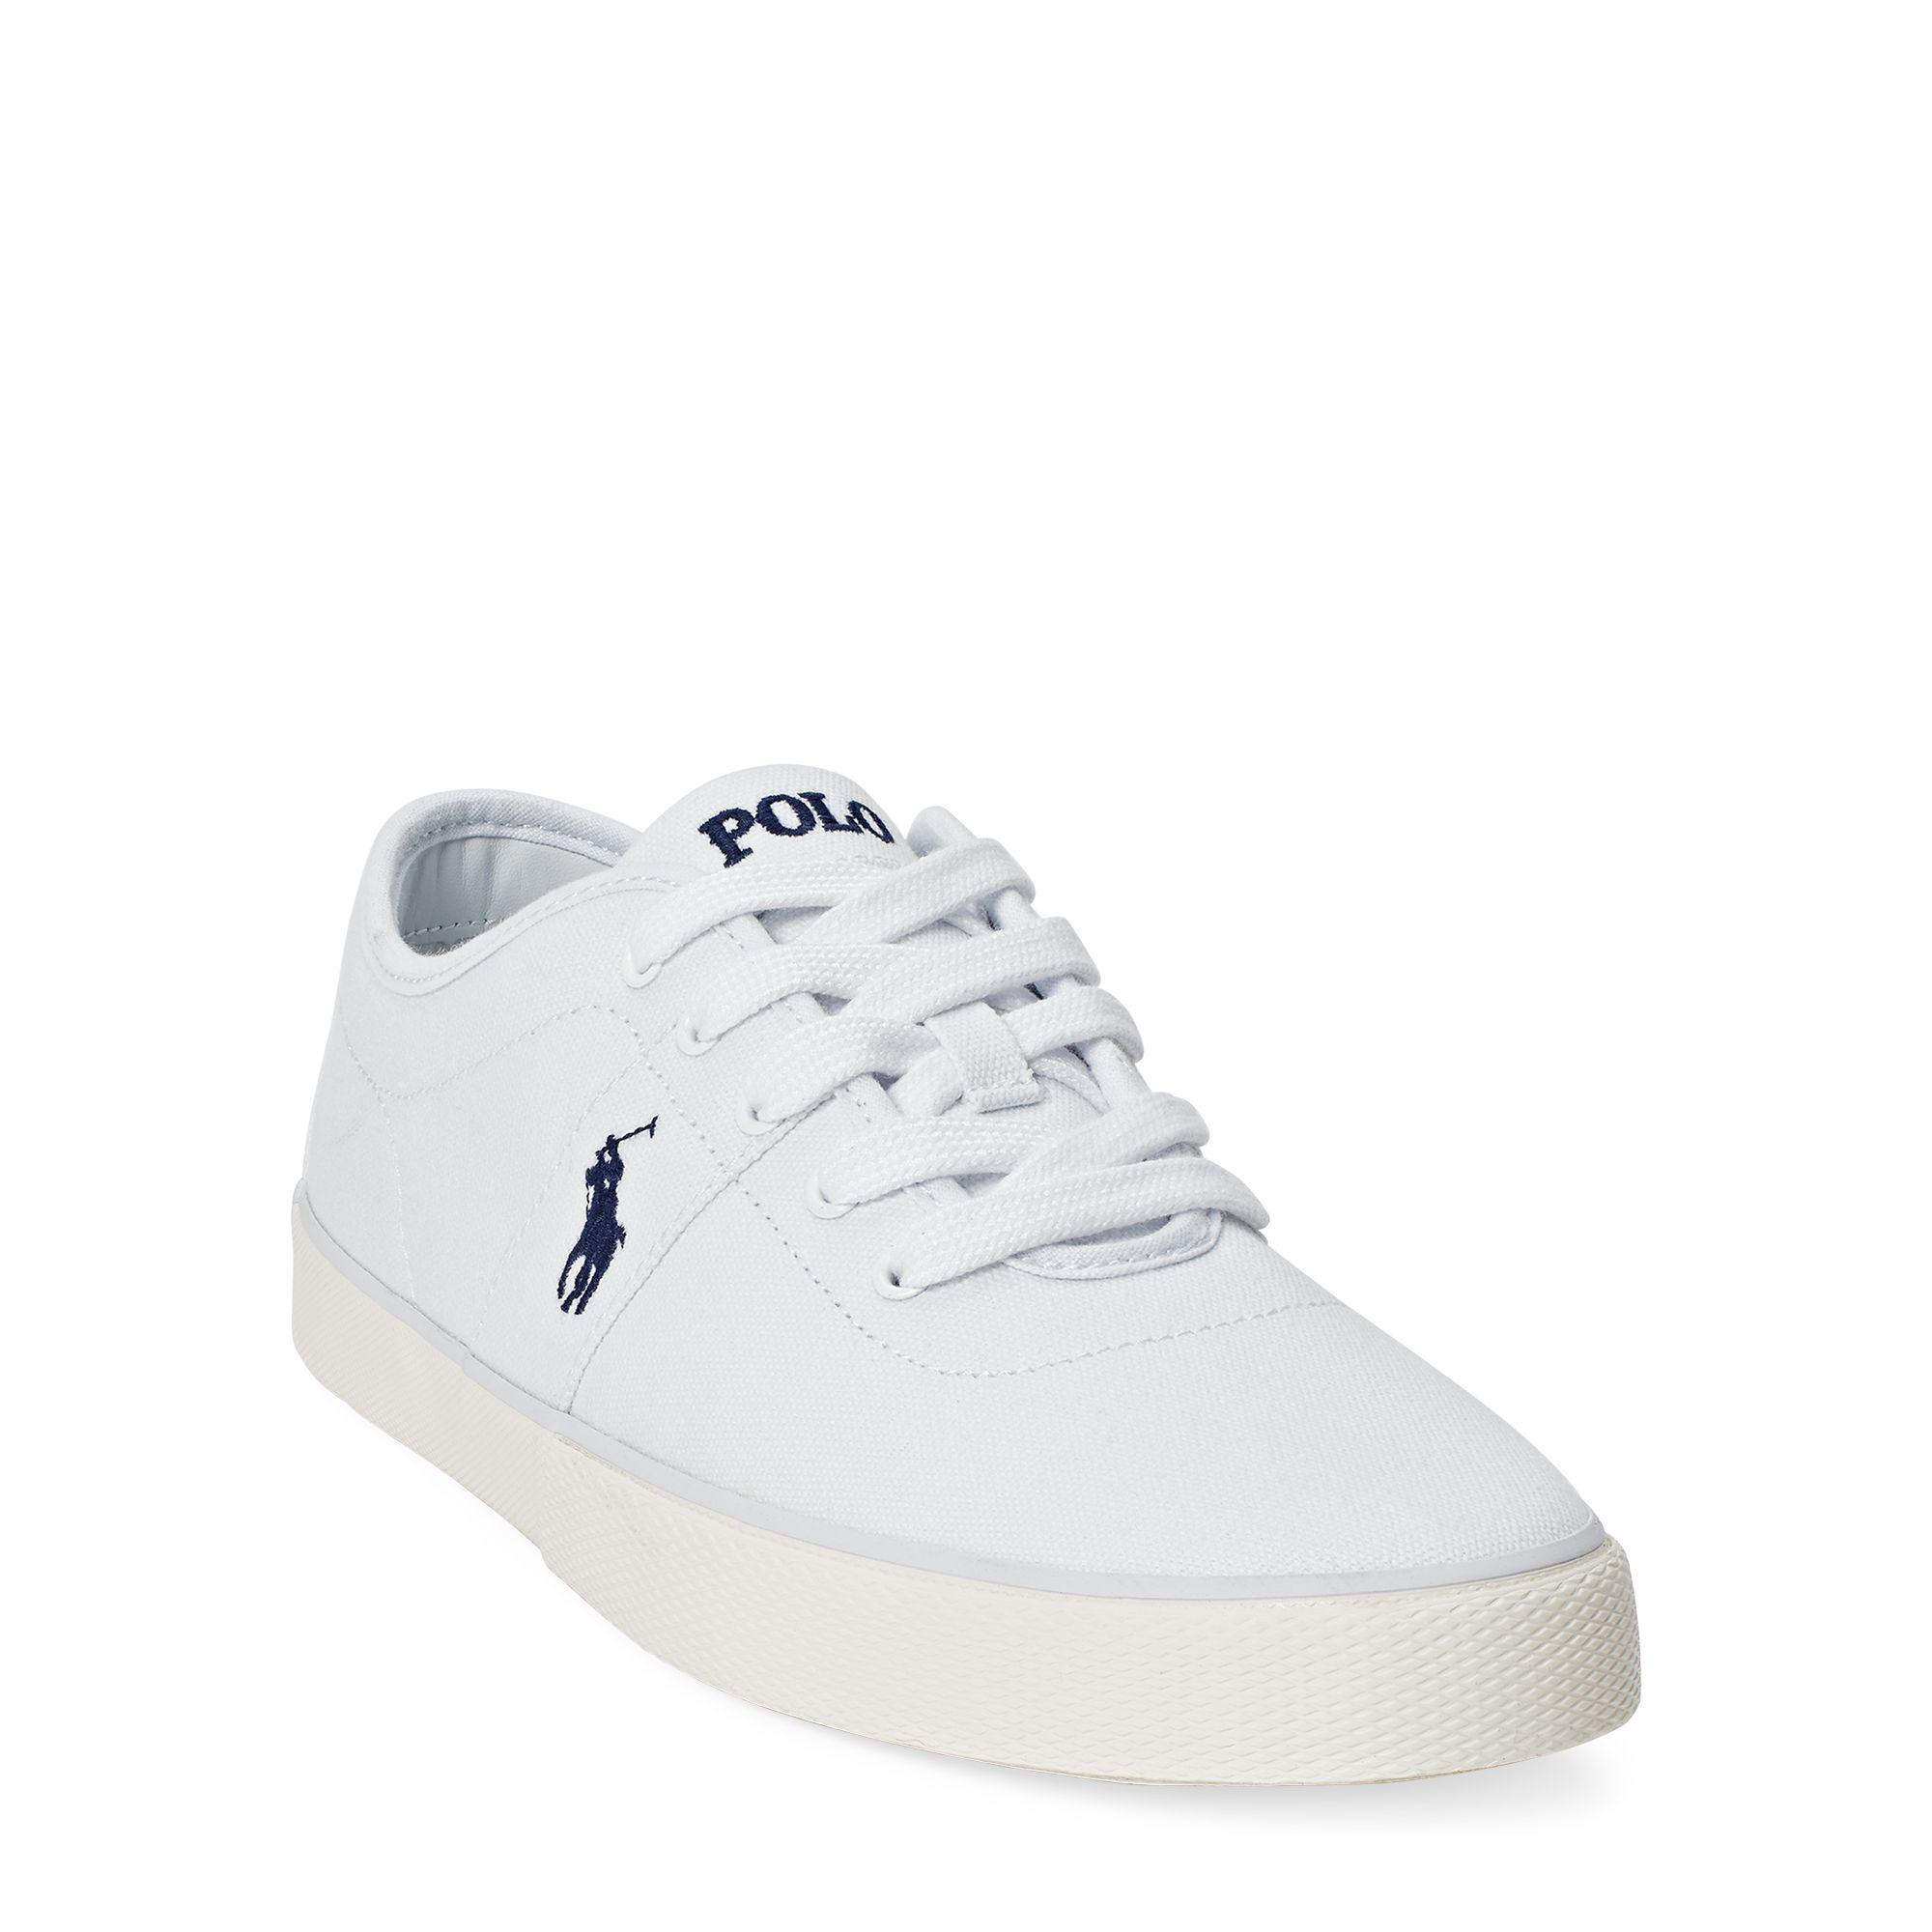 Polo Ralph Lauren Bas-tops Et Chaussures De Sport cnpTHHr